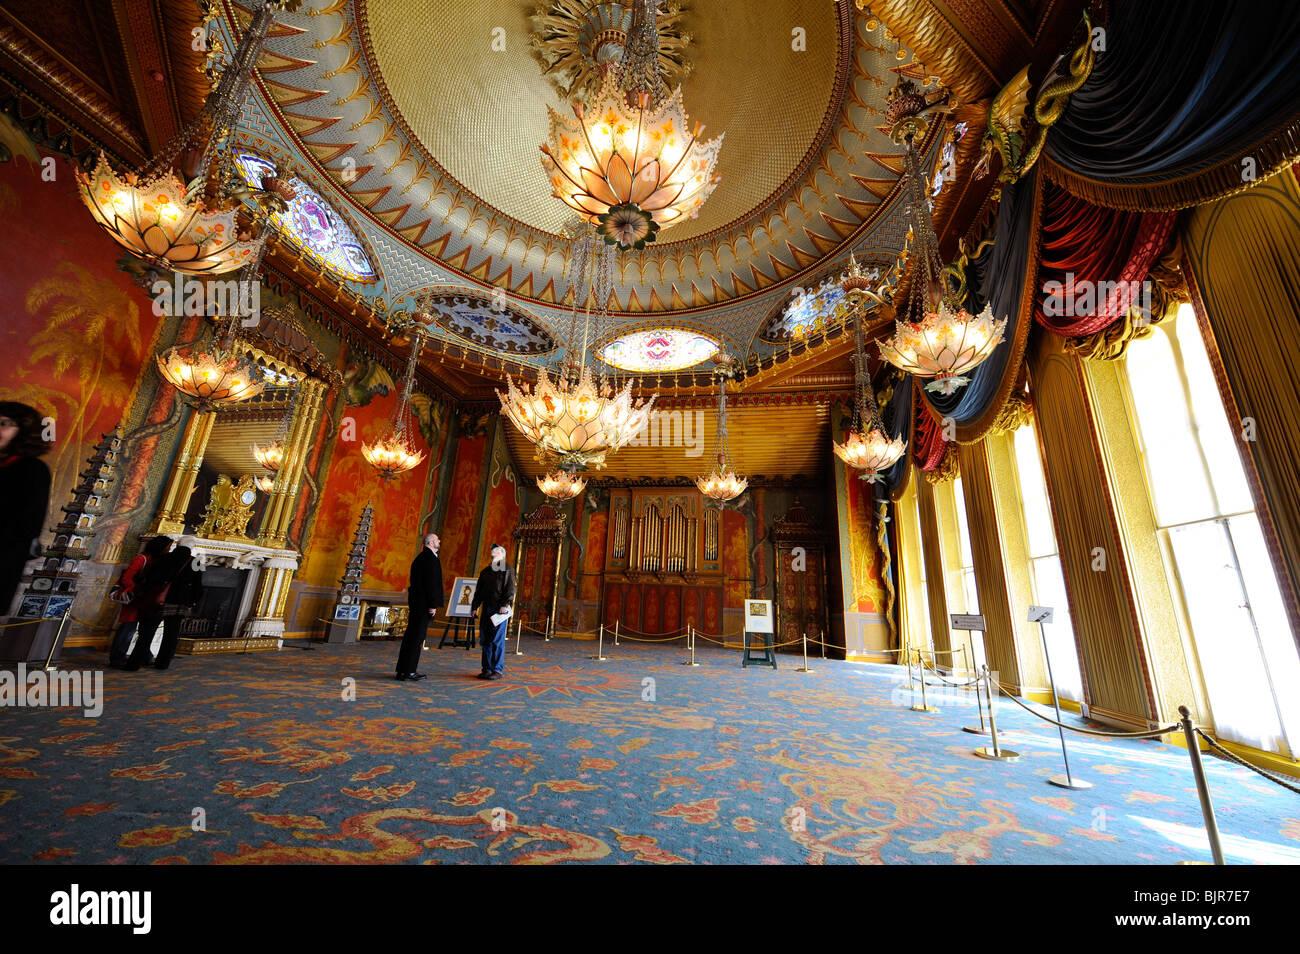 The Music room inside the Royal Pavilion - Brighton, UK Stock Photo ...